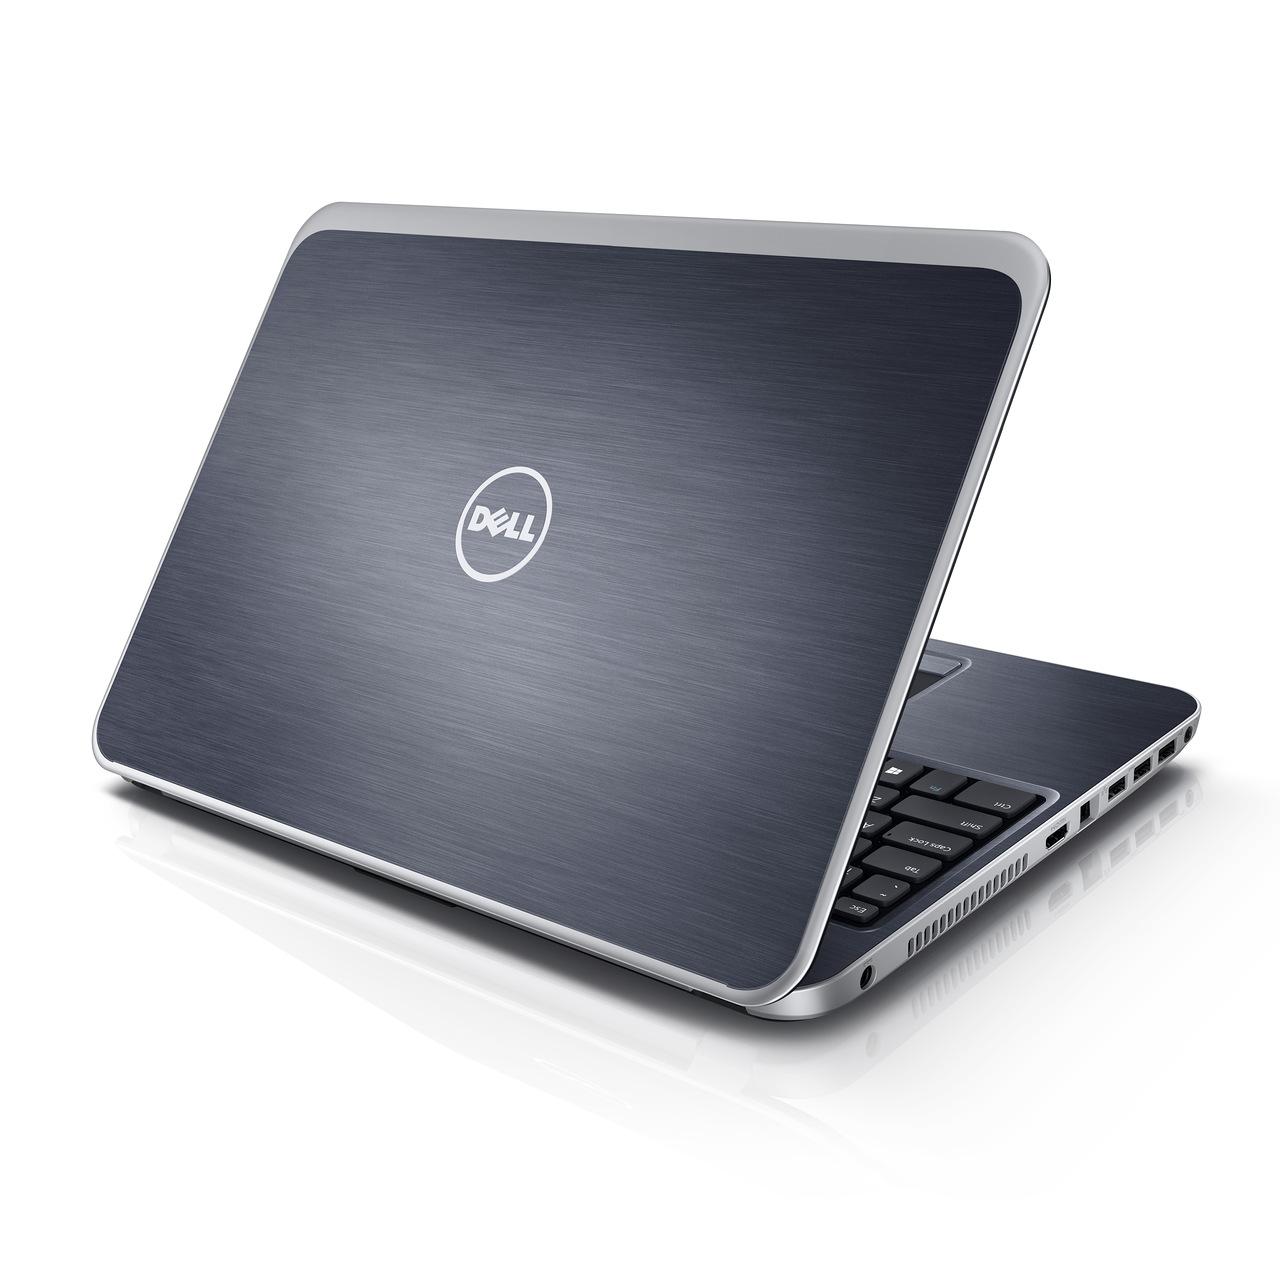 Dell lansirao novi Inspiron laptop 5521